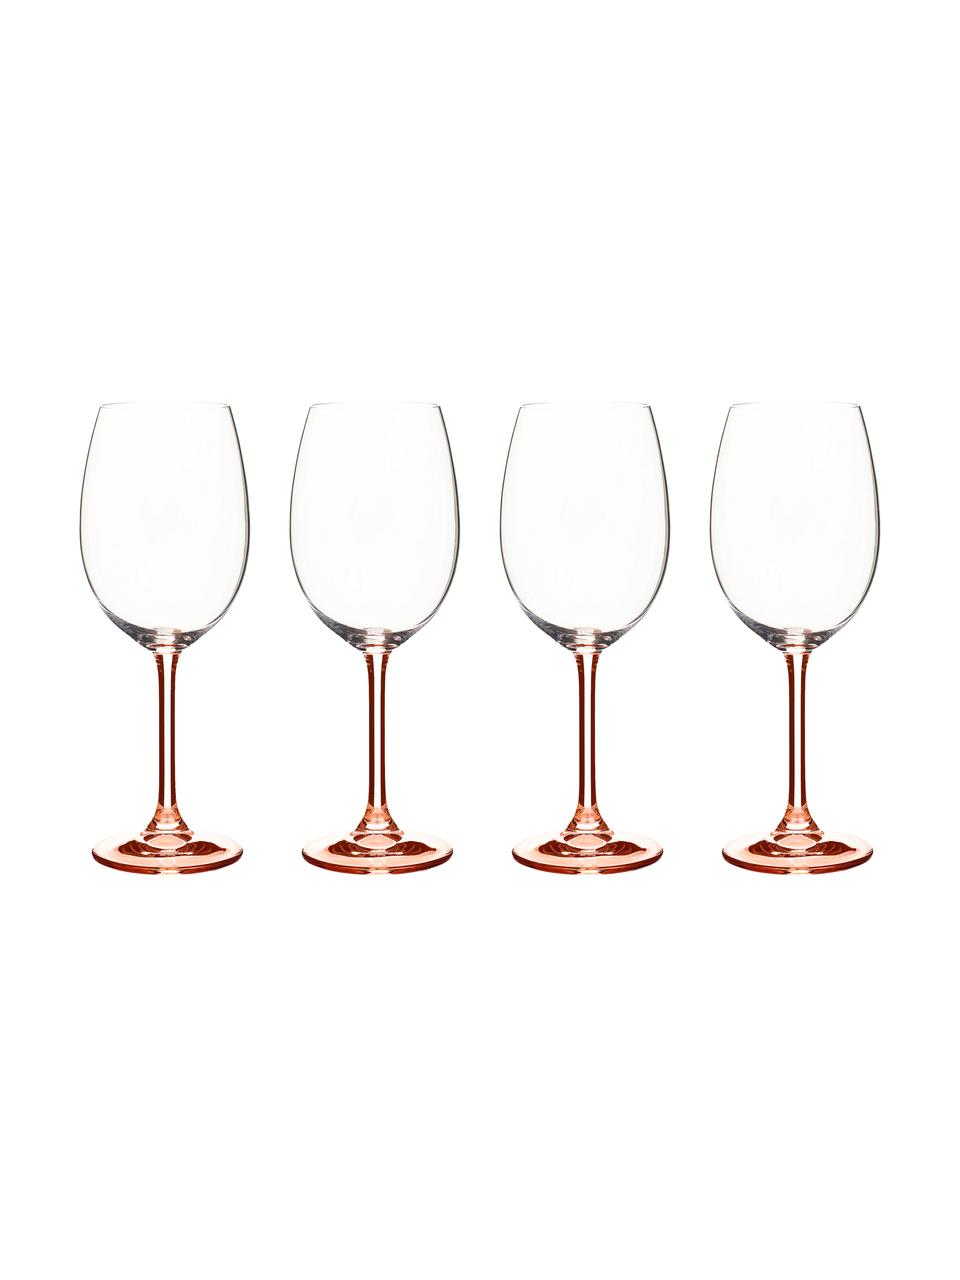 verres a vin rouge avec pied en teinte rose 4 pieces